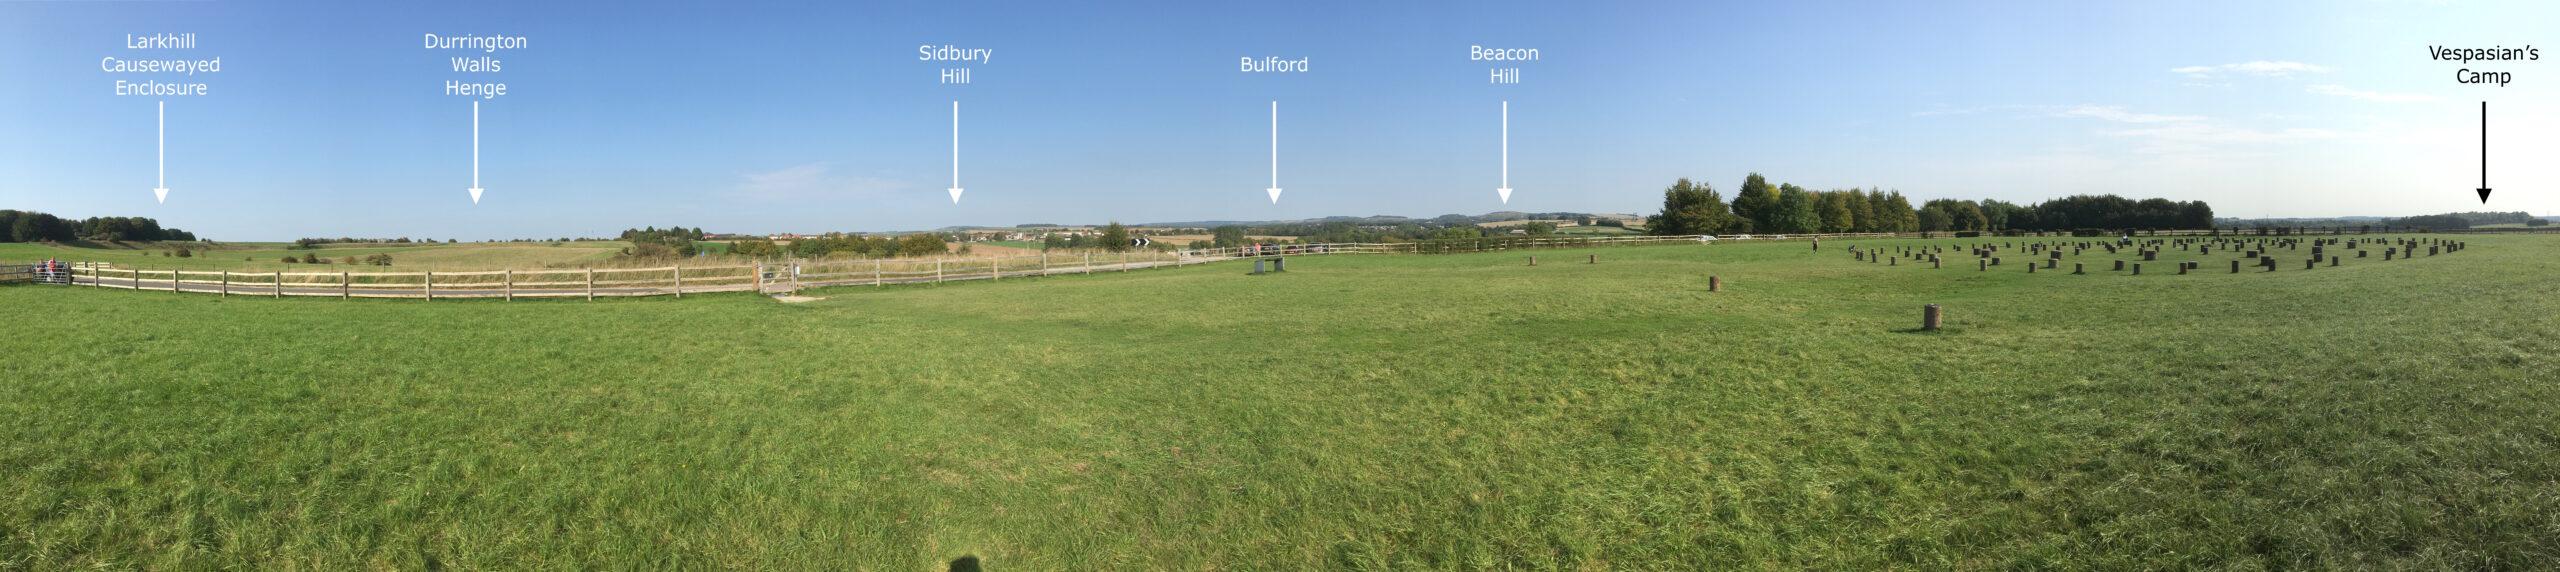 Woodhenge Eastern Horizon panorama. Stonehenge World Heritage Site